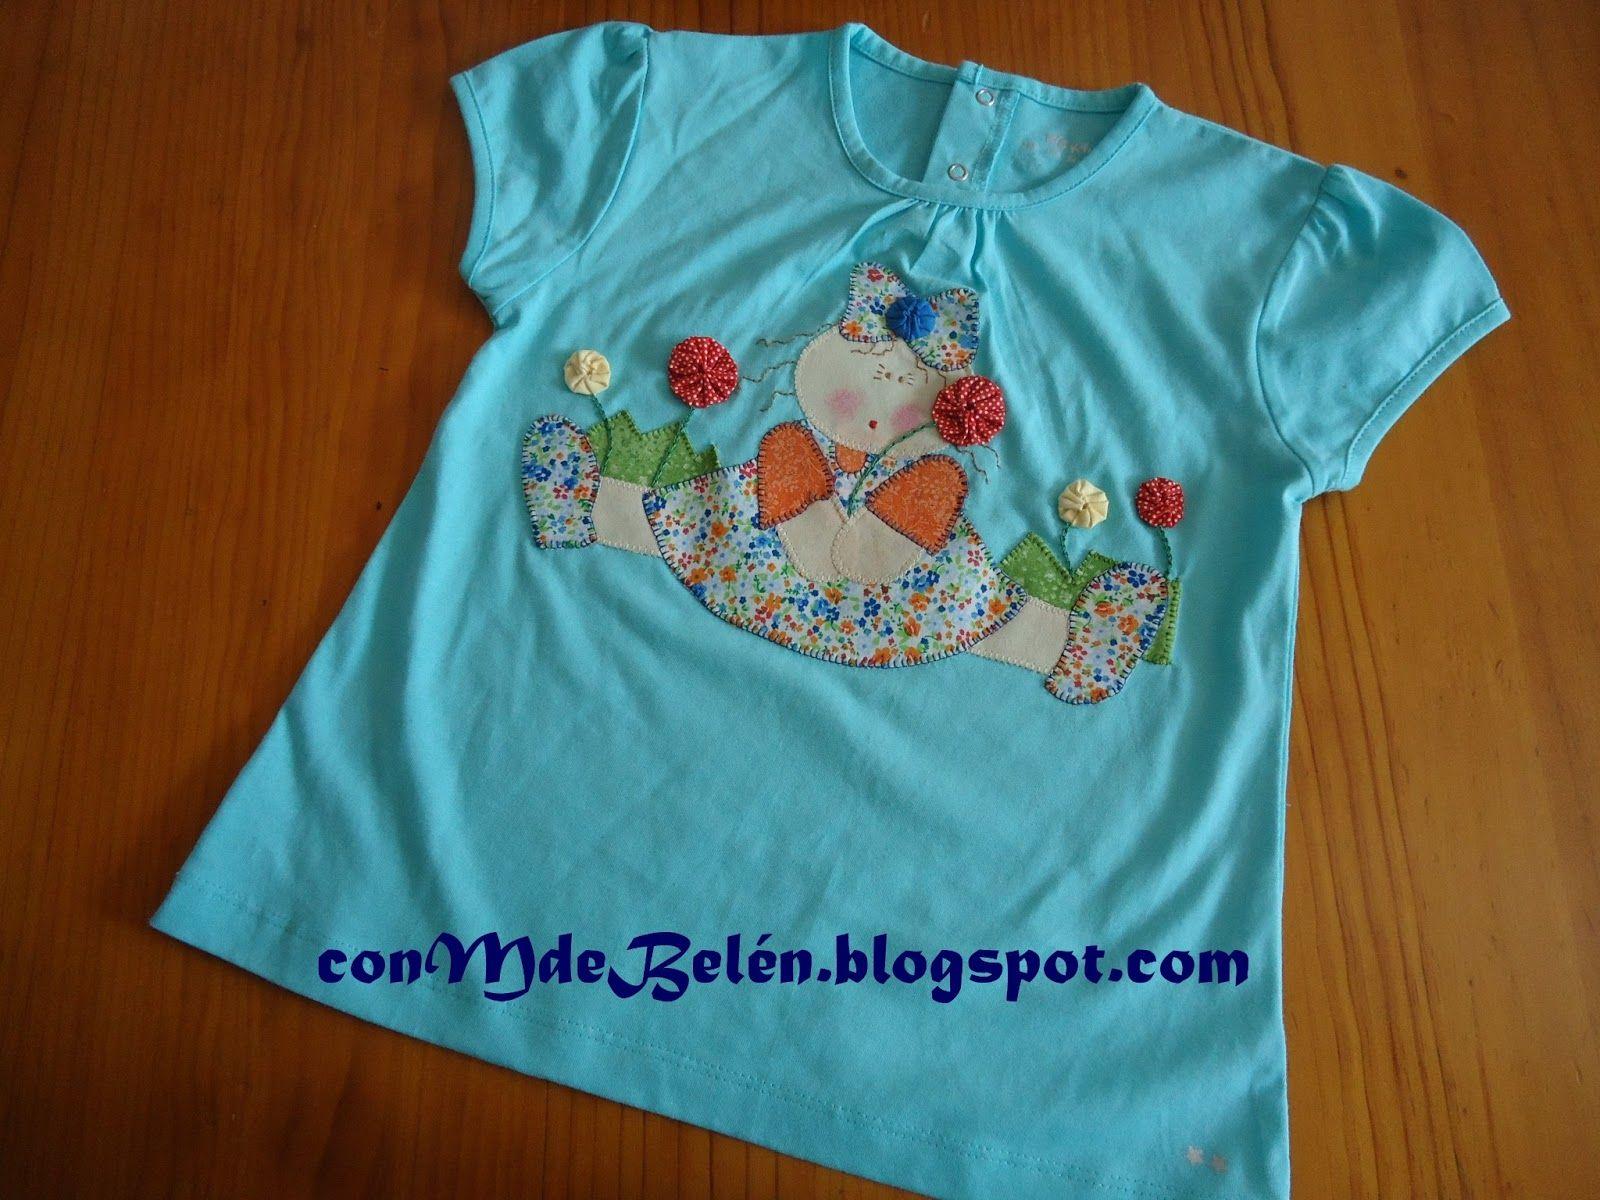 Con M de Belen: Camisetas